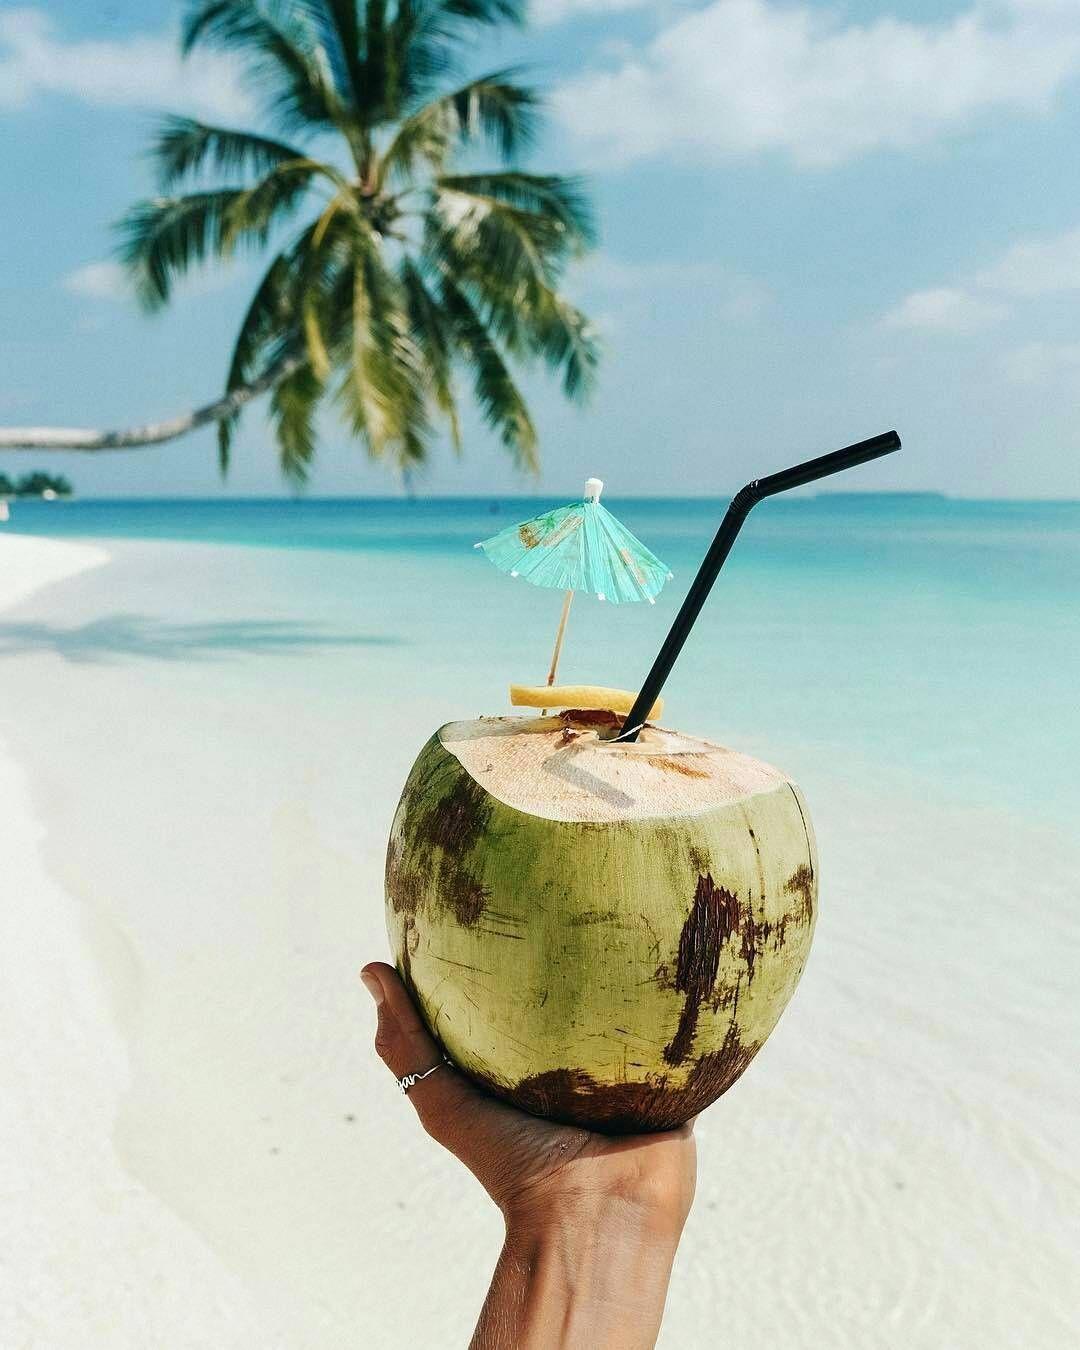 Sun Island Beach Maldives: Conrad Maldives Rangali Island #Maldives